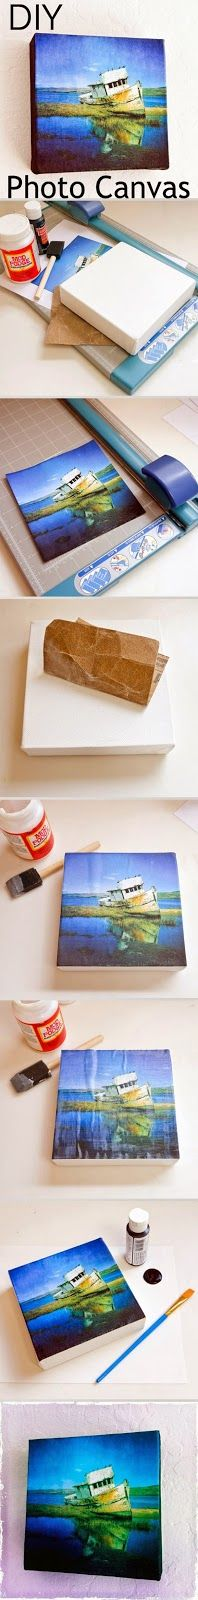 Best DIY Projects: DIY Instagram canvas prints